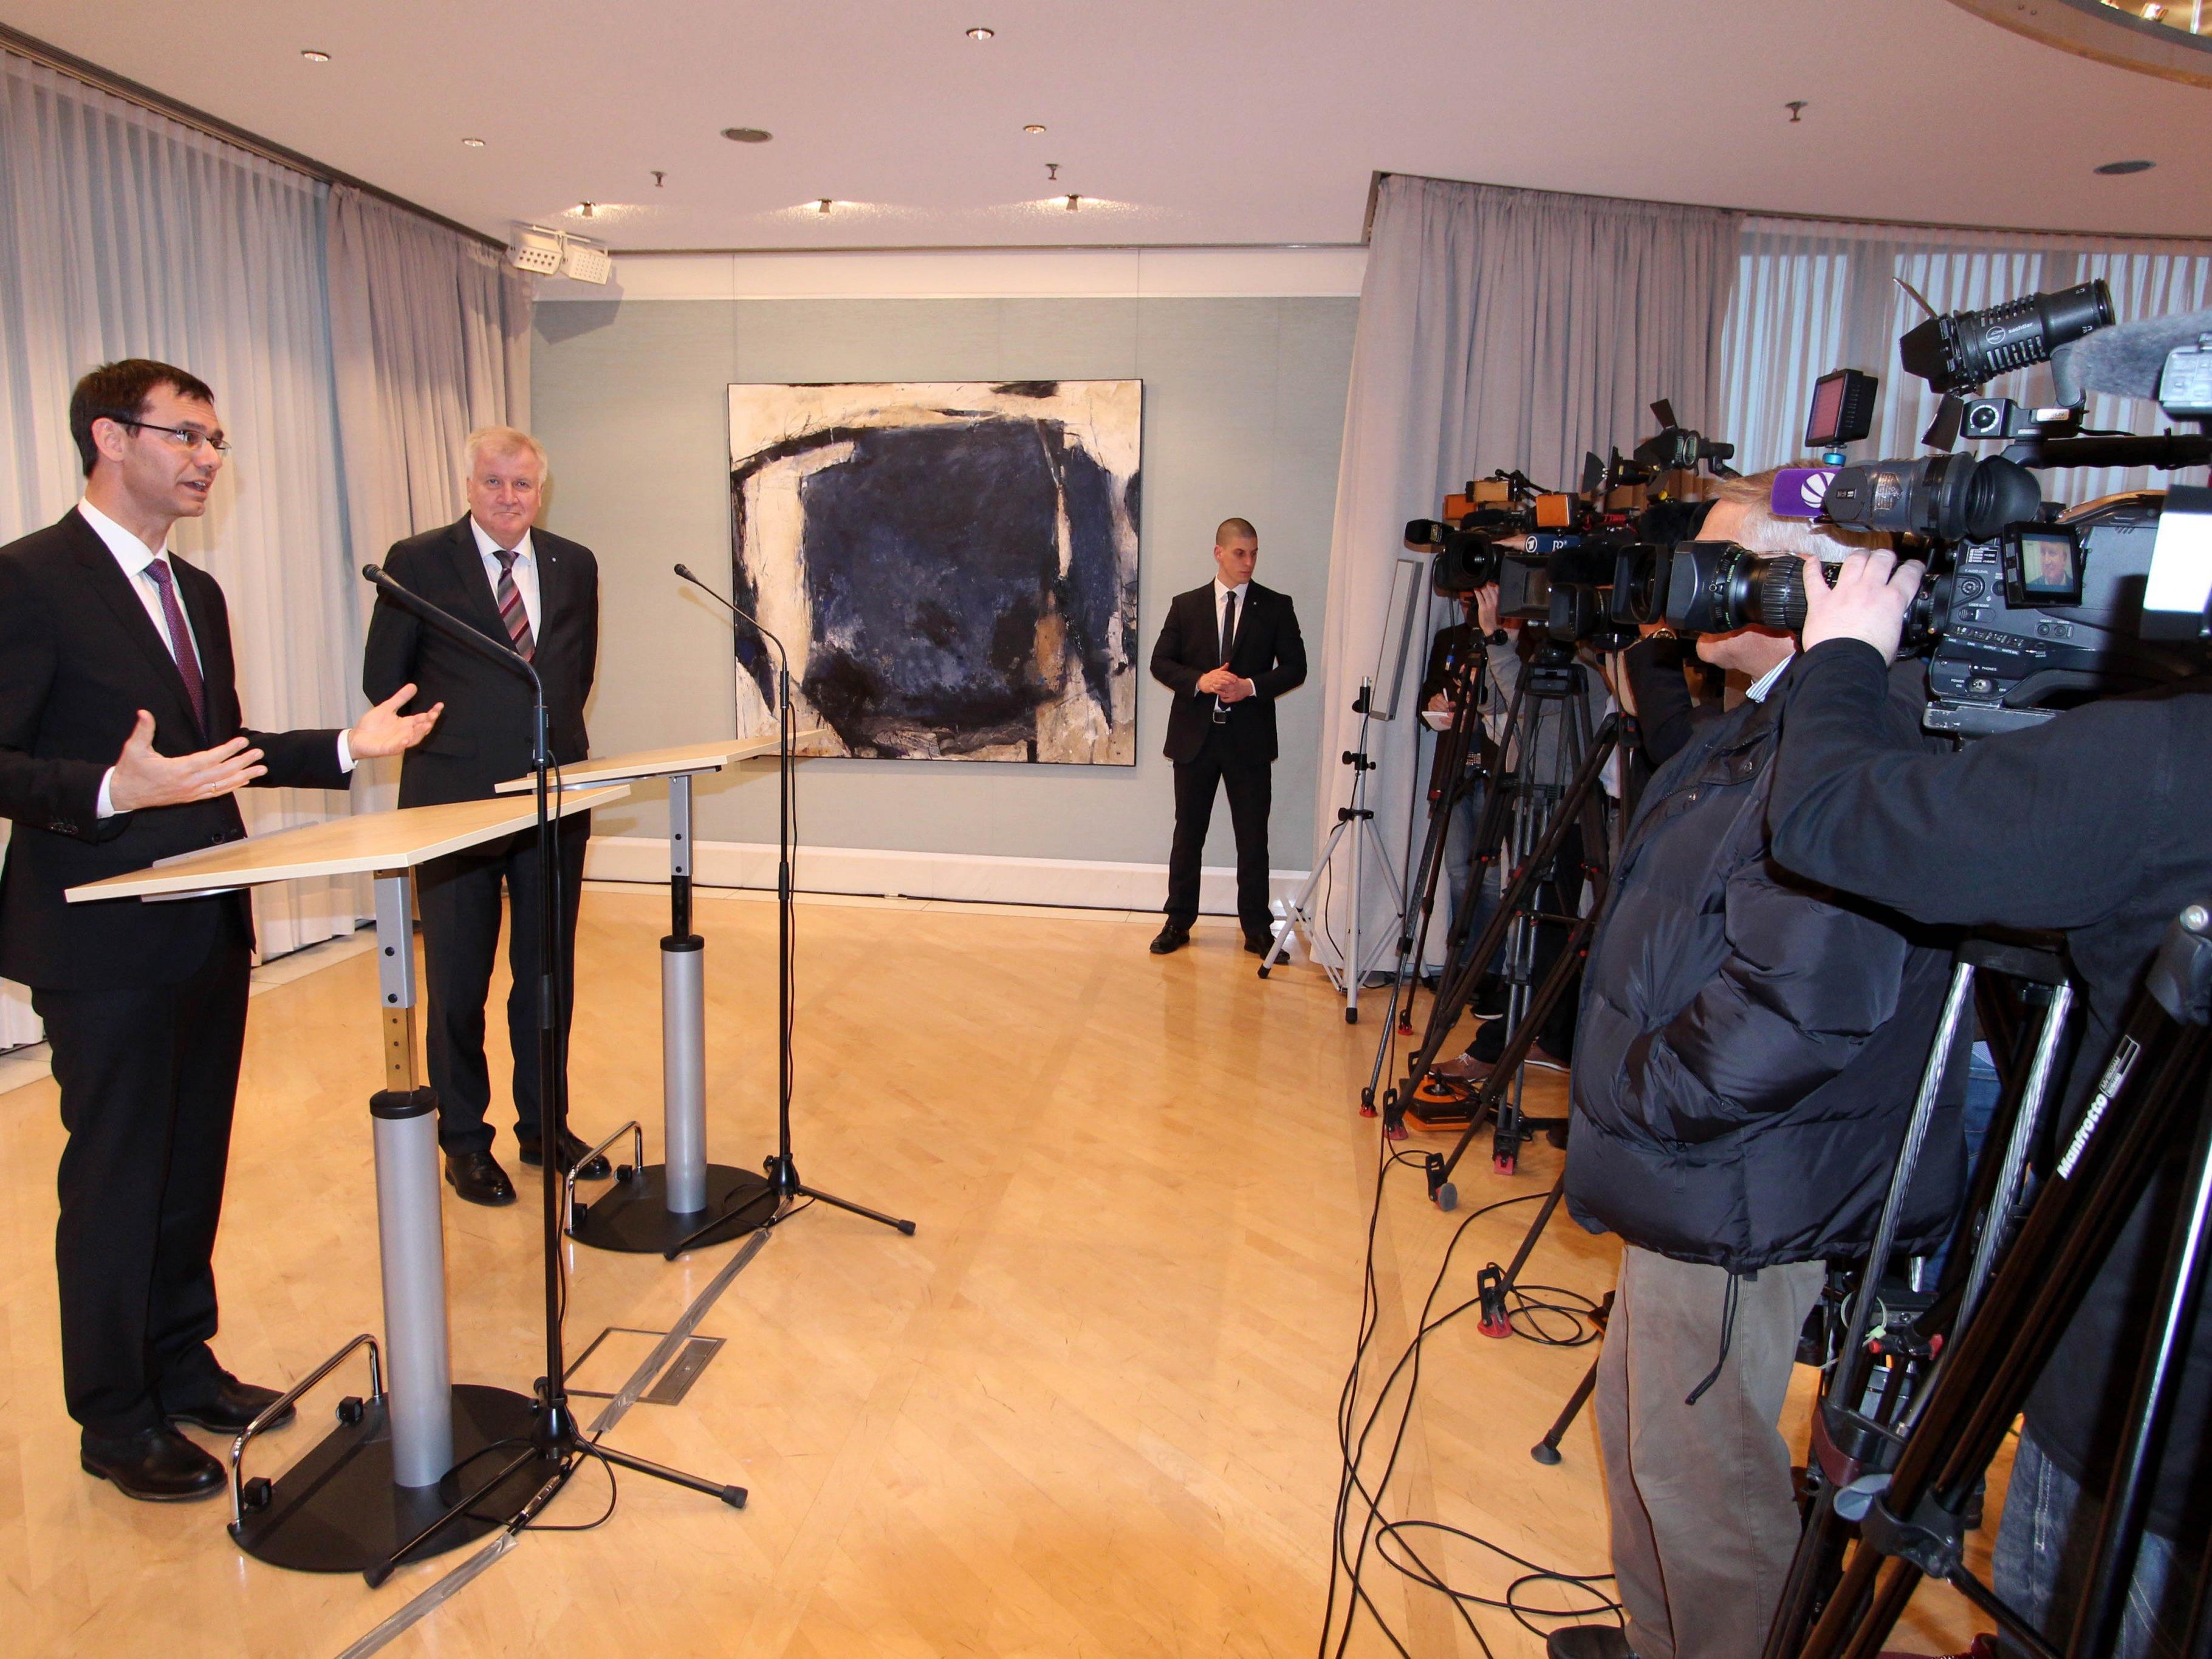 Im Februar dieses Jahres besuchte LH Wallner Bayerns Ministerpräsident Horst Seehofer.